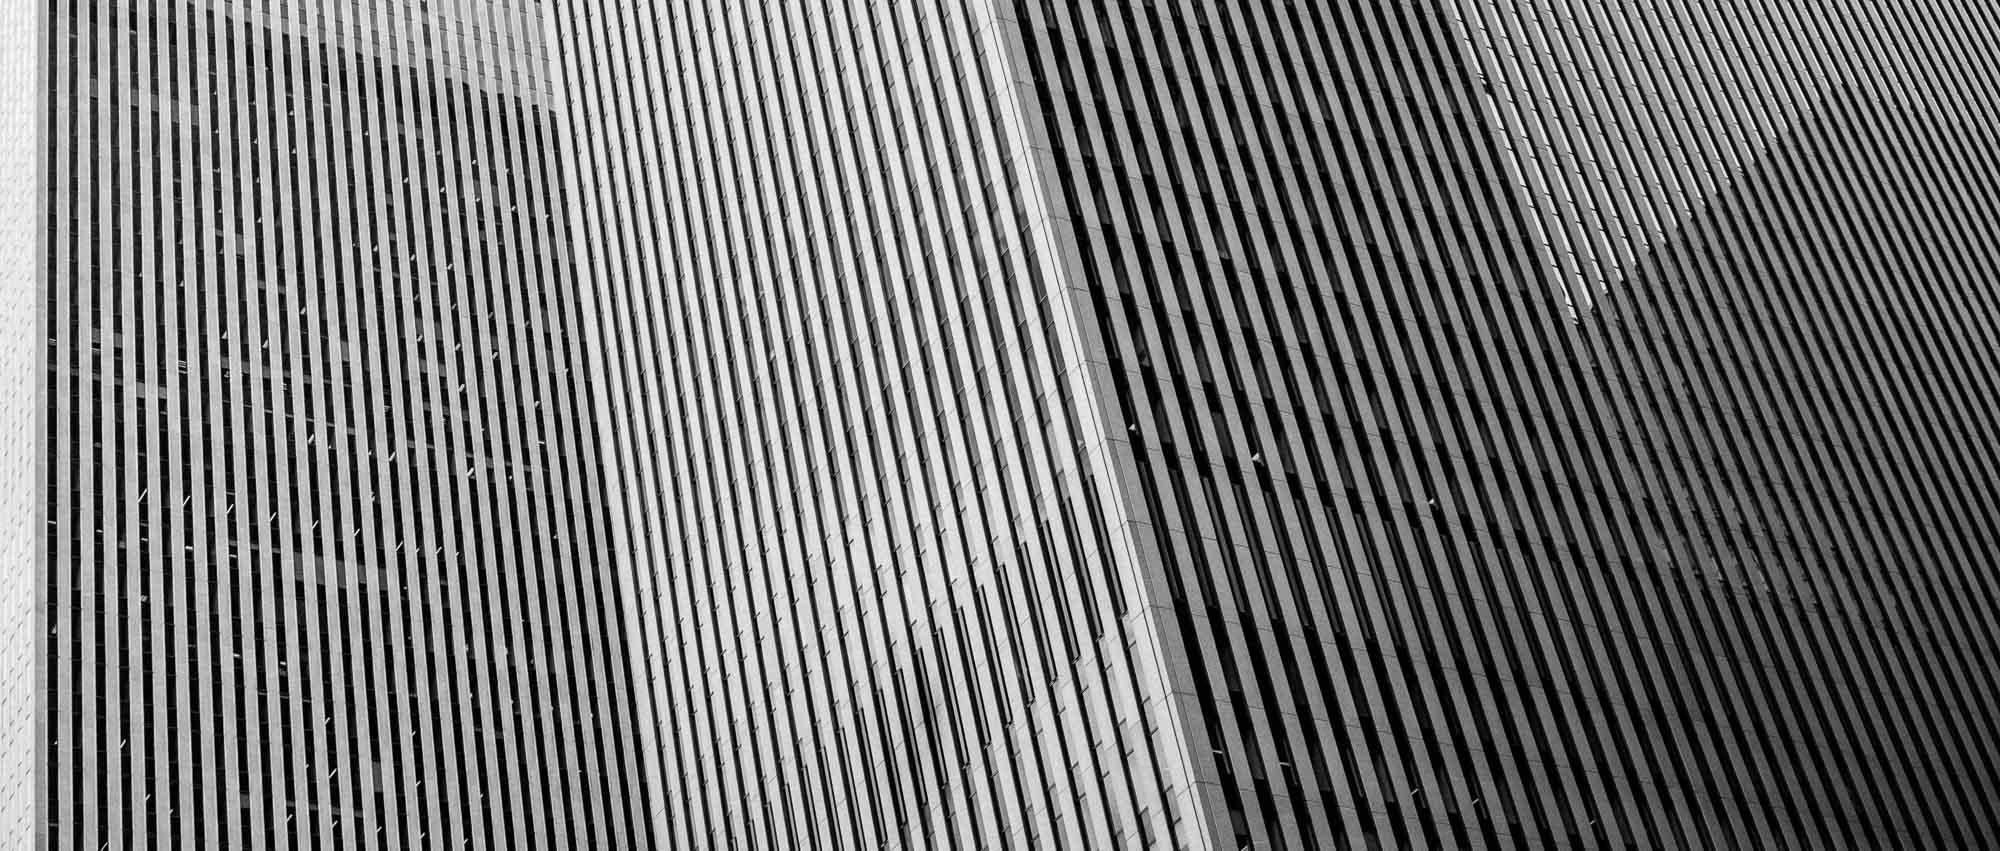 reise bericht new york gotham hochhäuser fith avenue